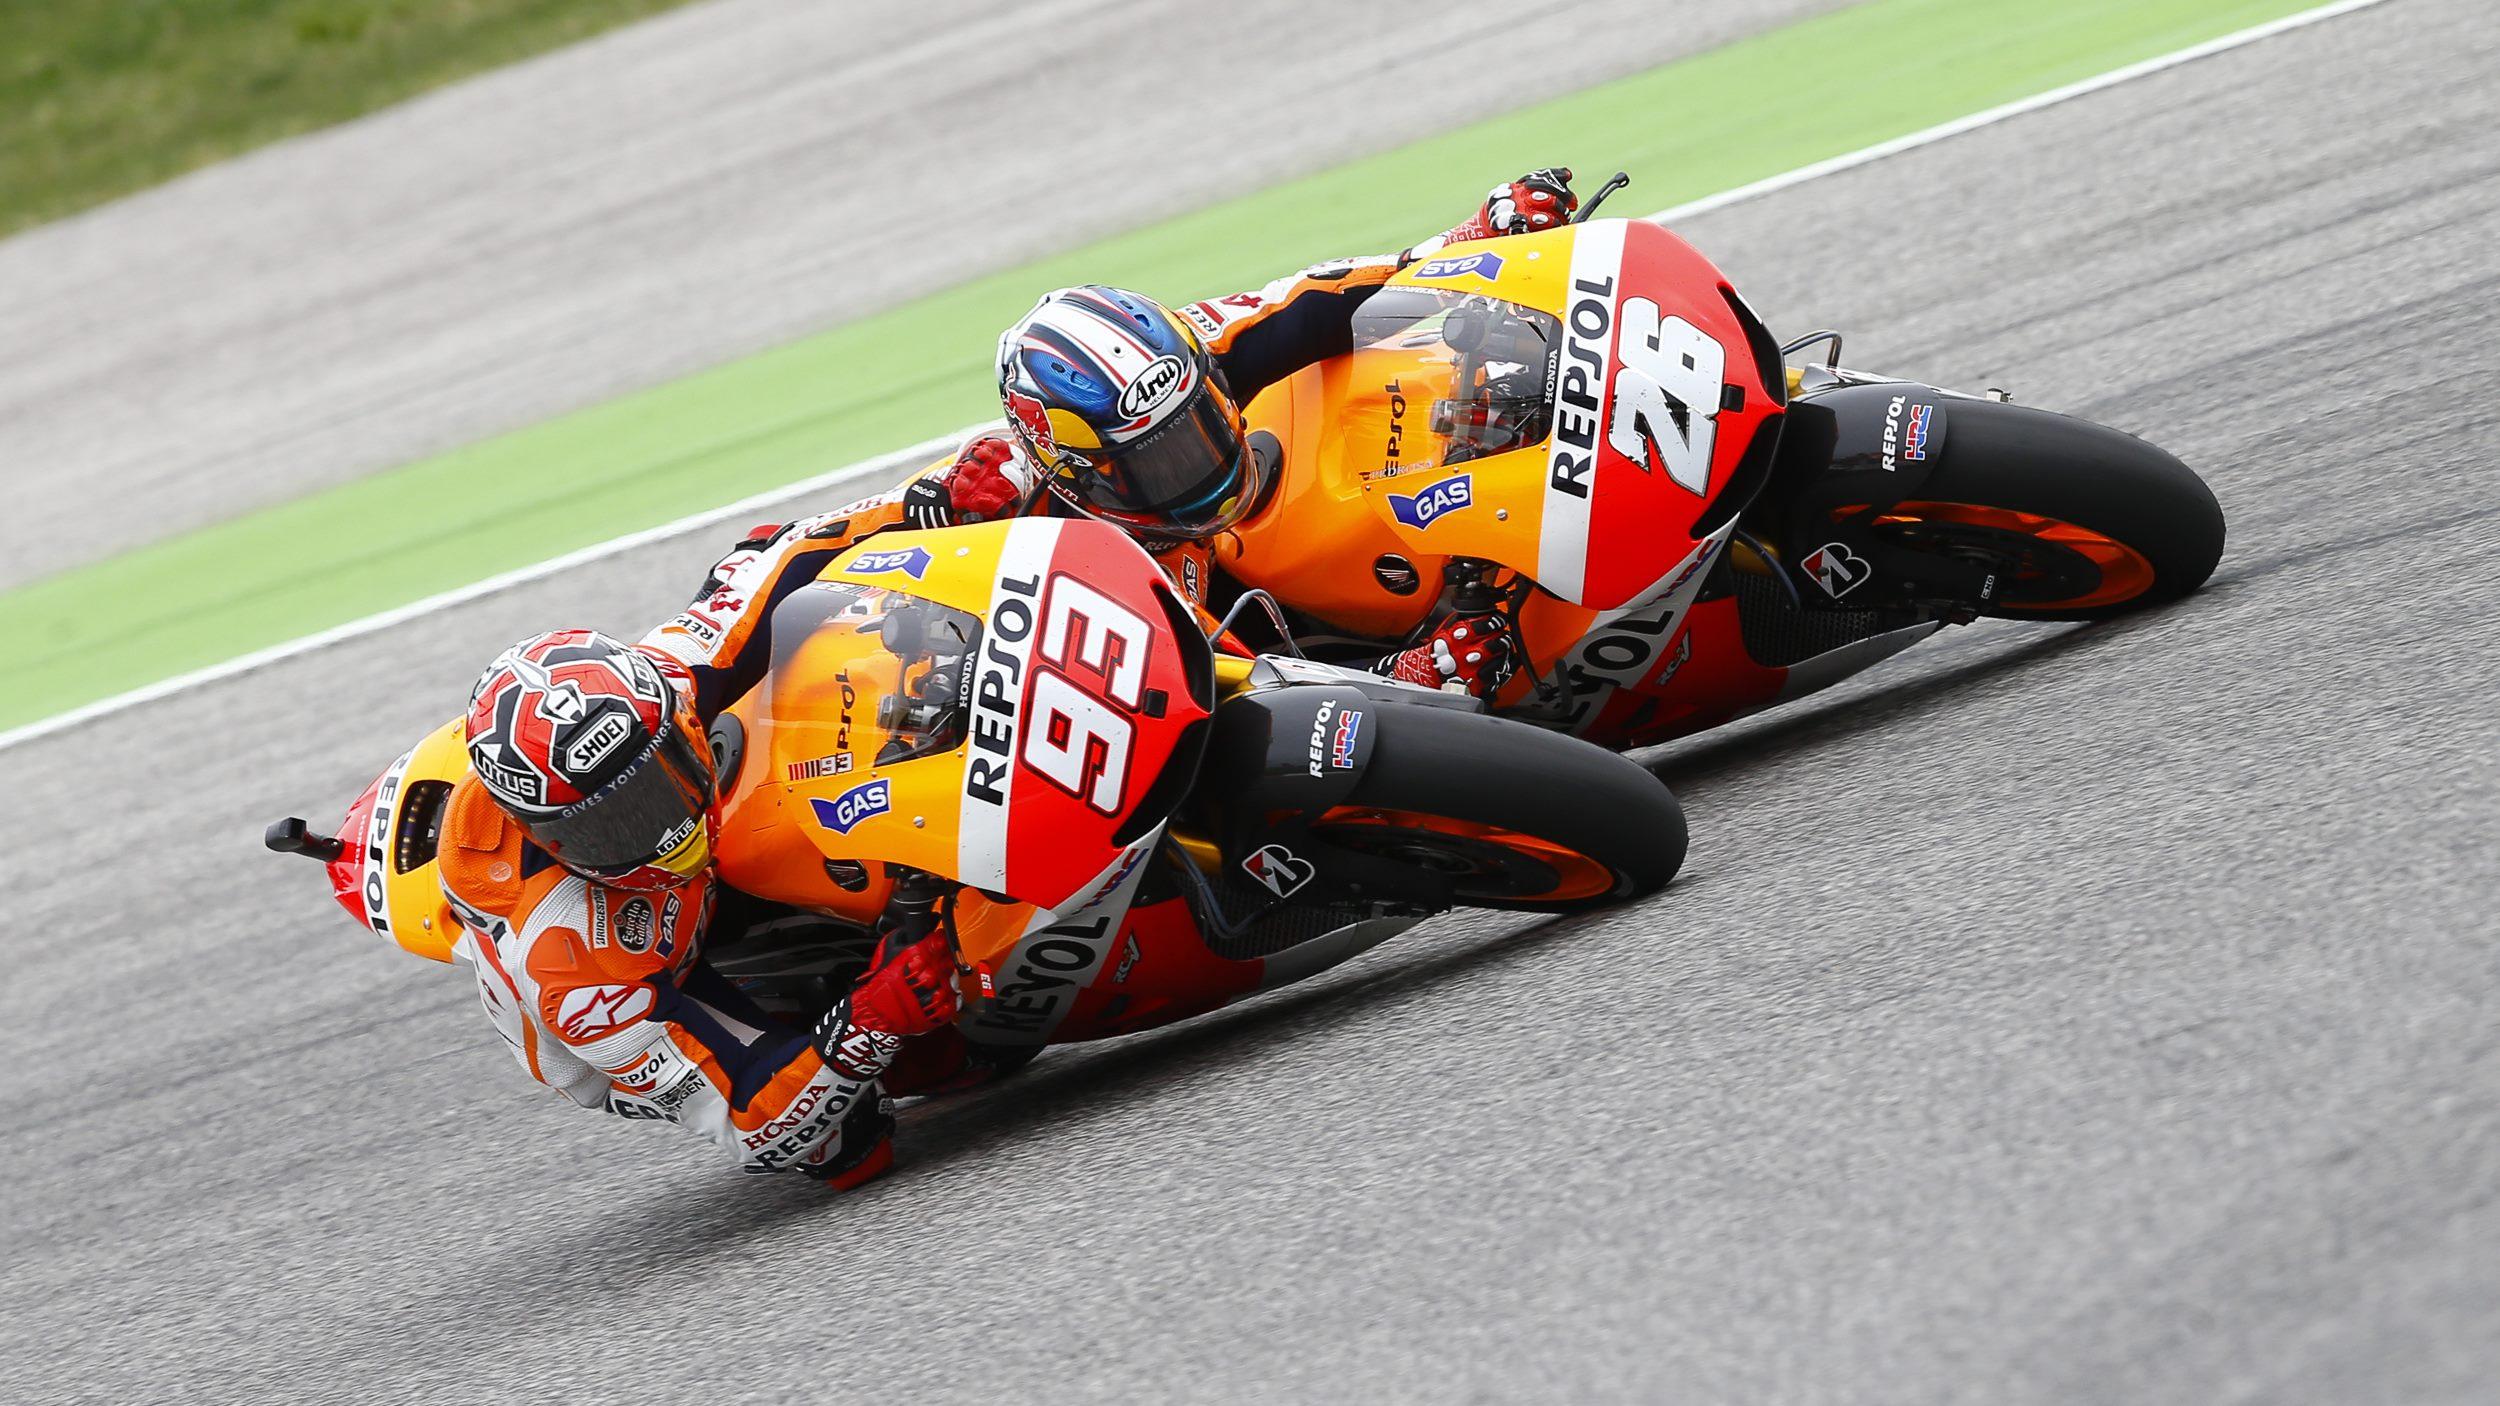 Dirio Moto GP 2015 Corrida01 On Two Wheels 2500x1406